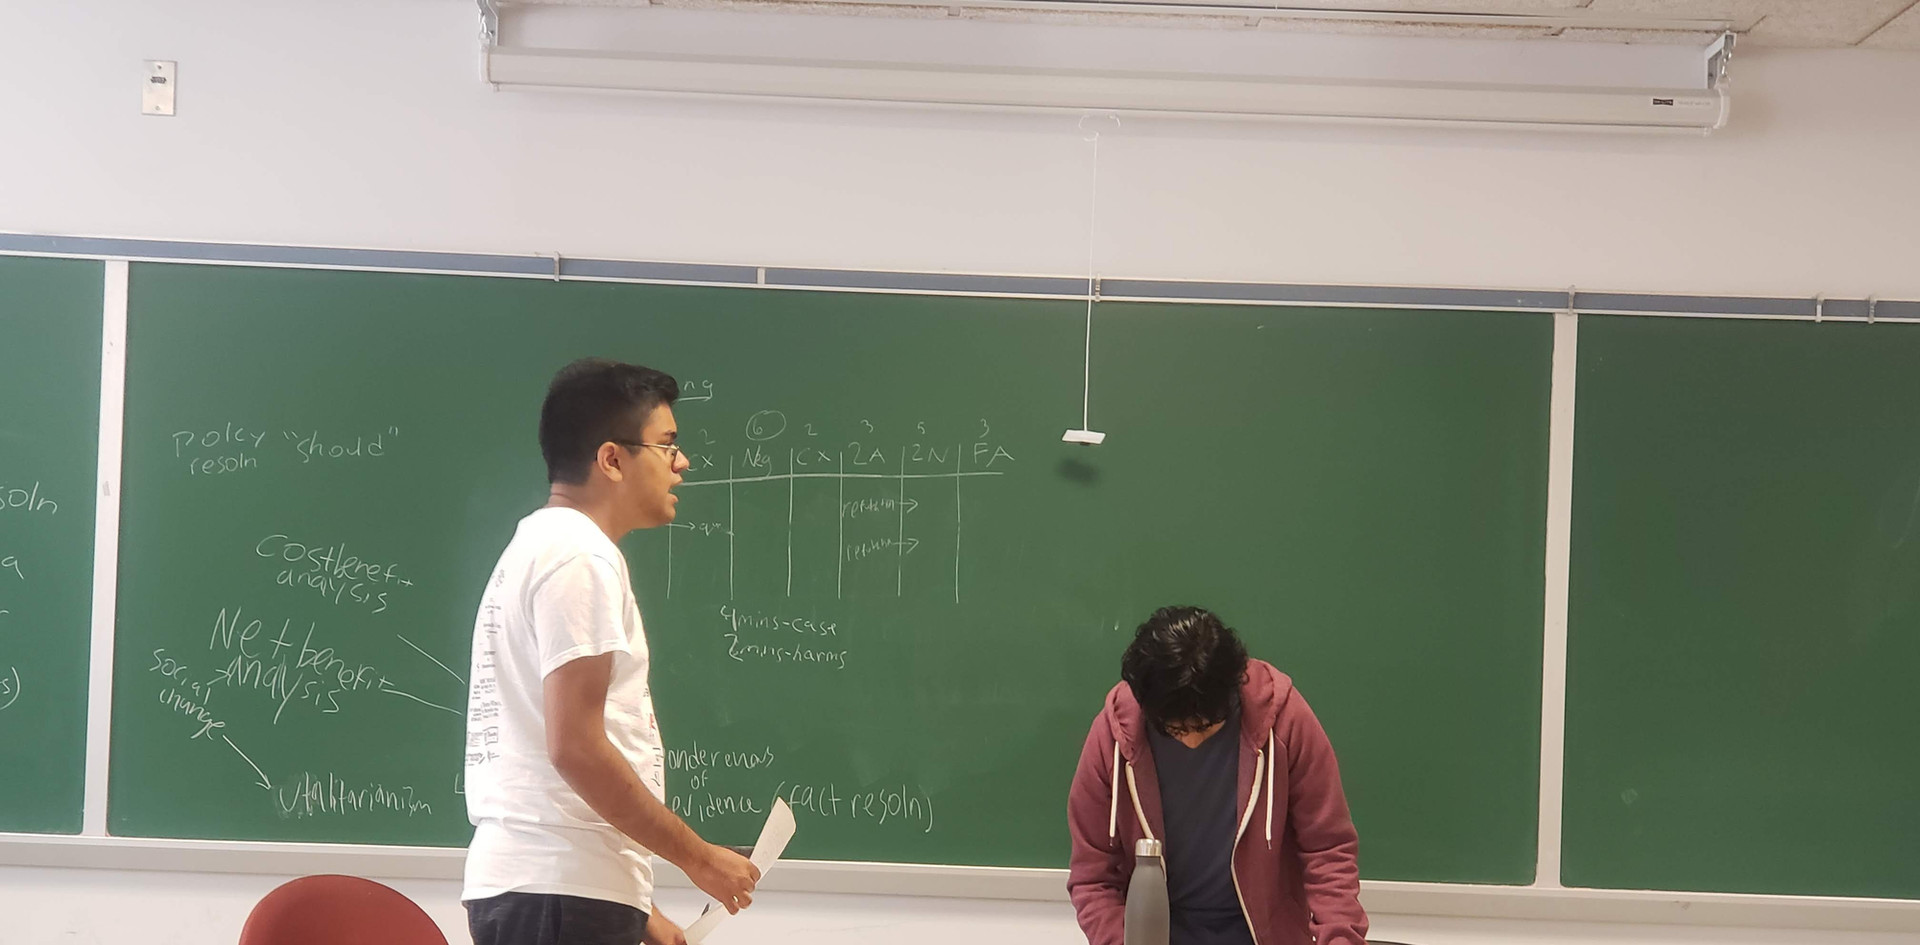 Debate Practice Session